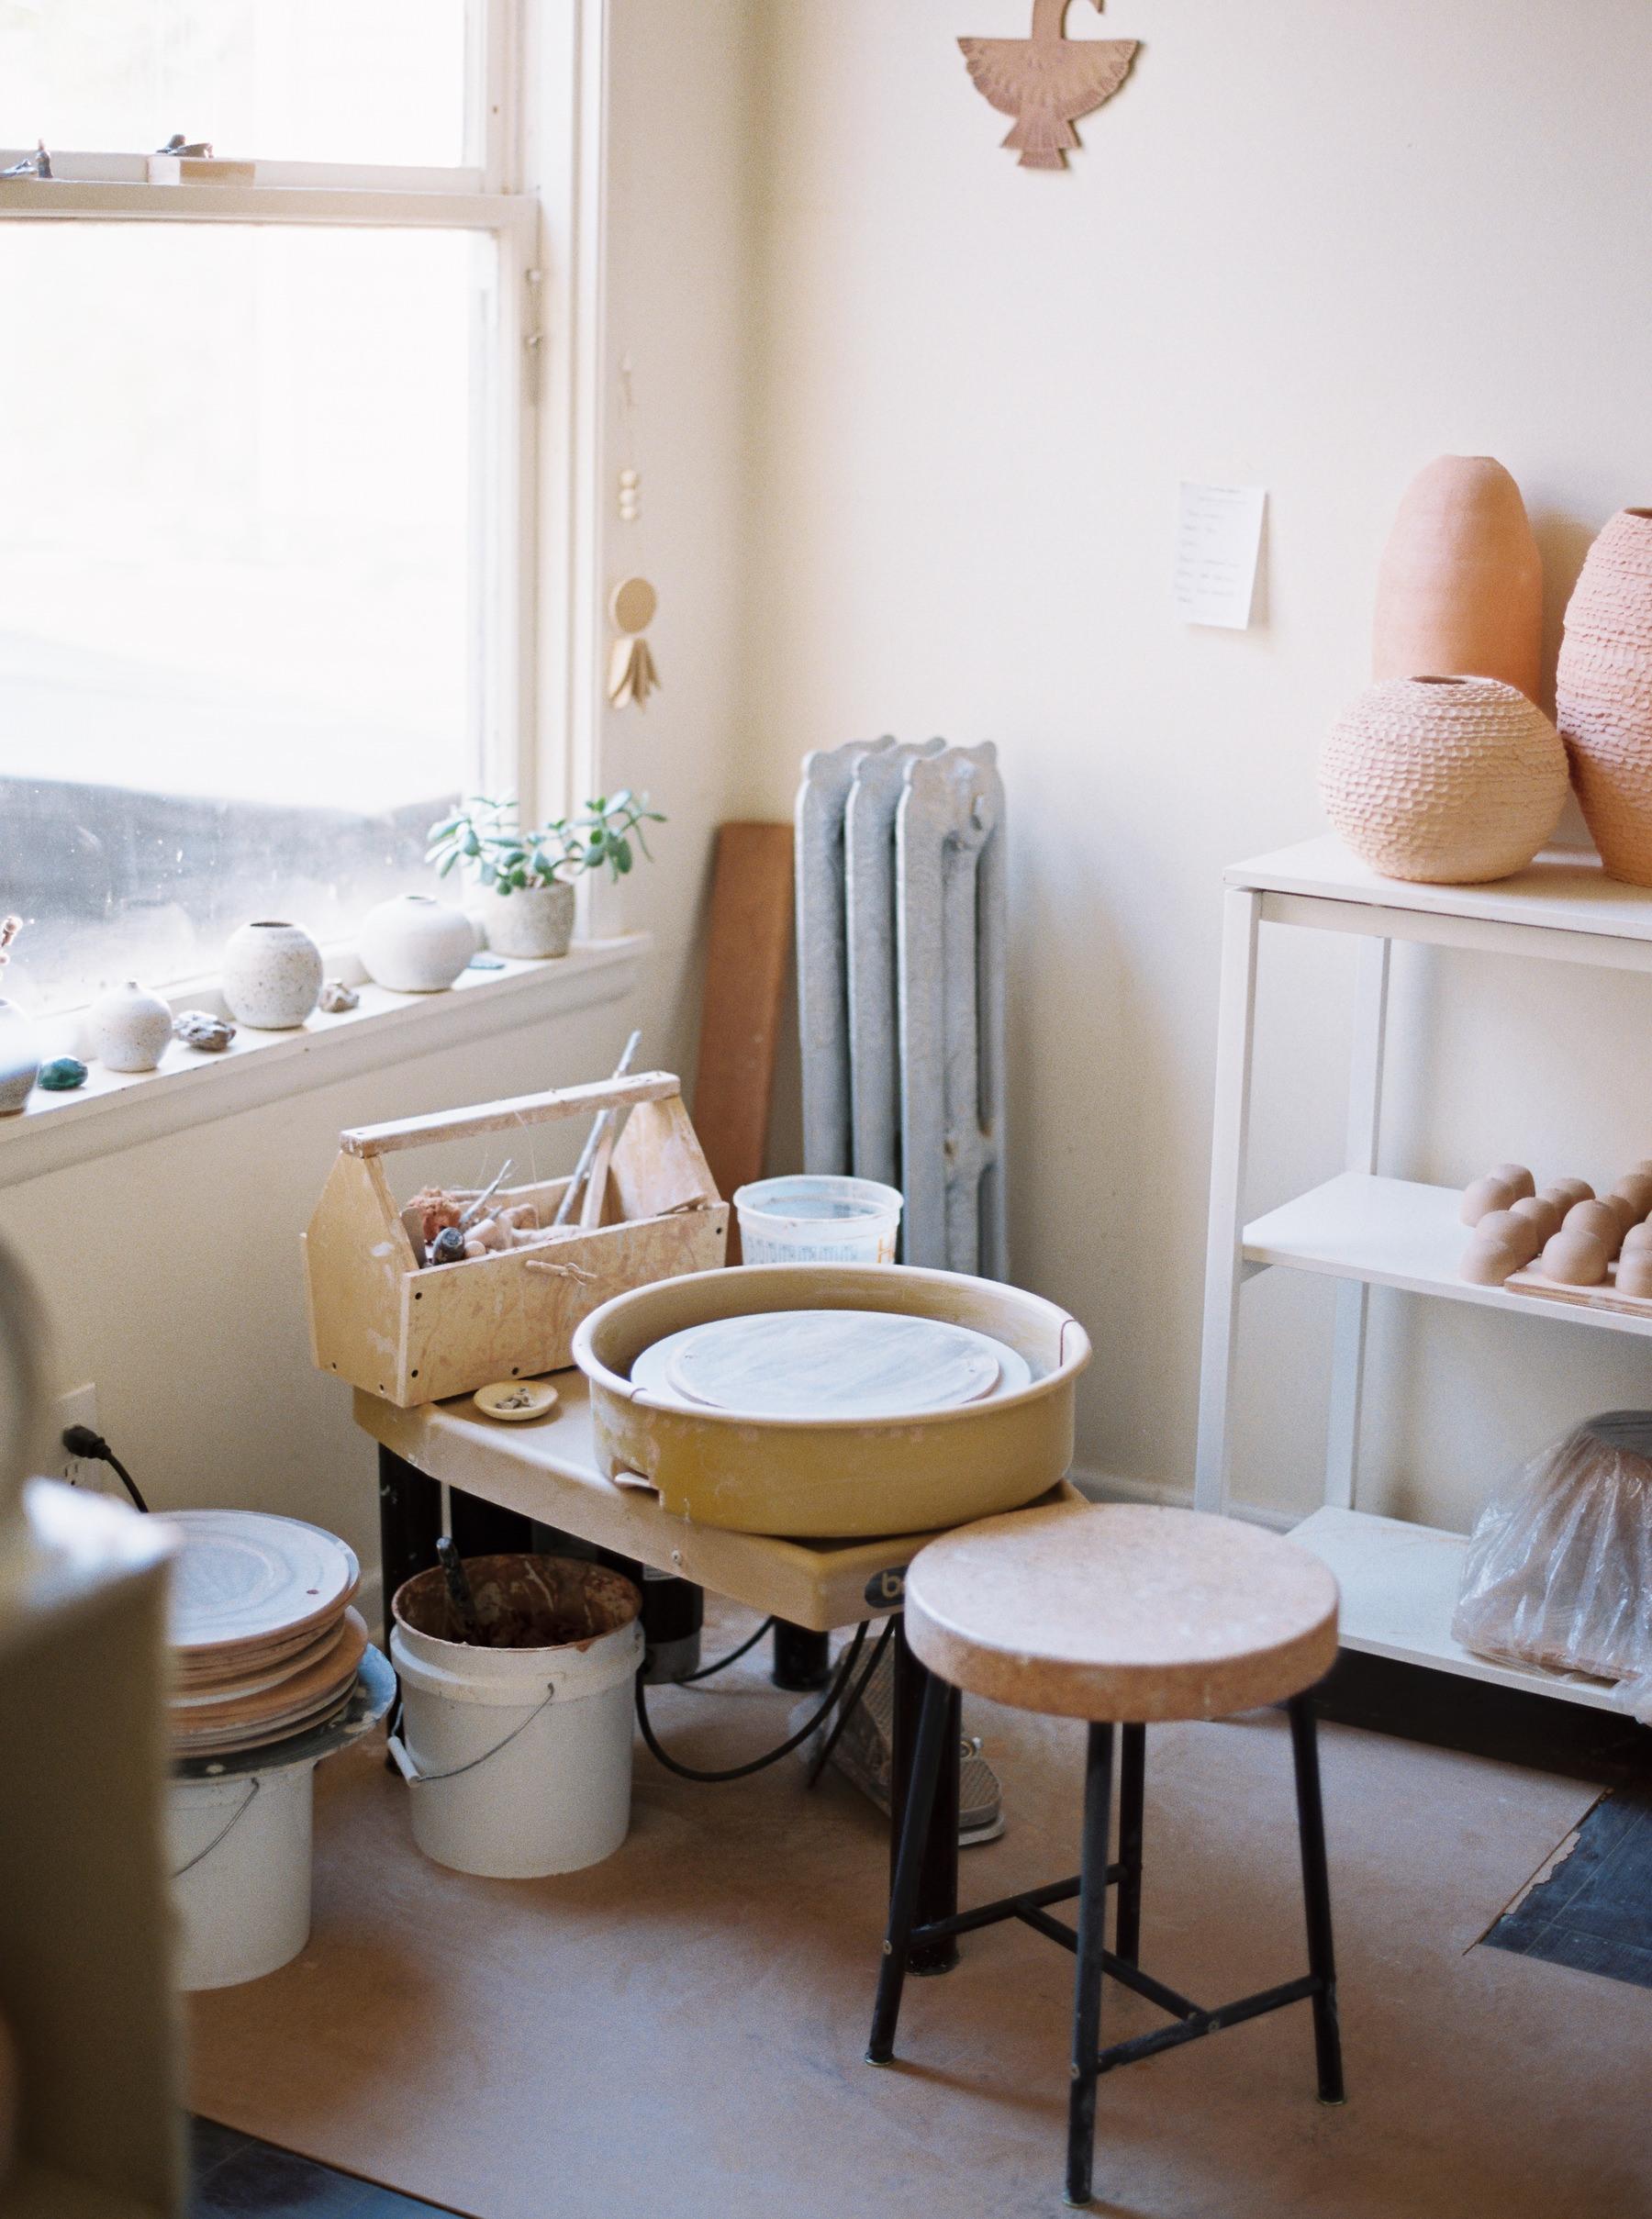 artistprofile-katherinemoes-pottery-annapeters-annapetersphoto-unearthing.tc-35.jpg